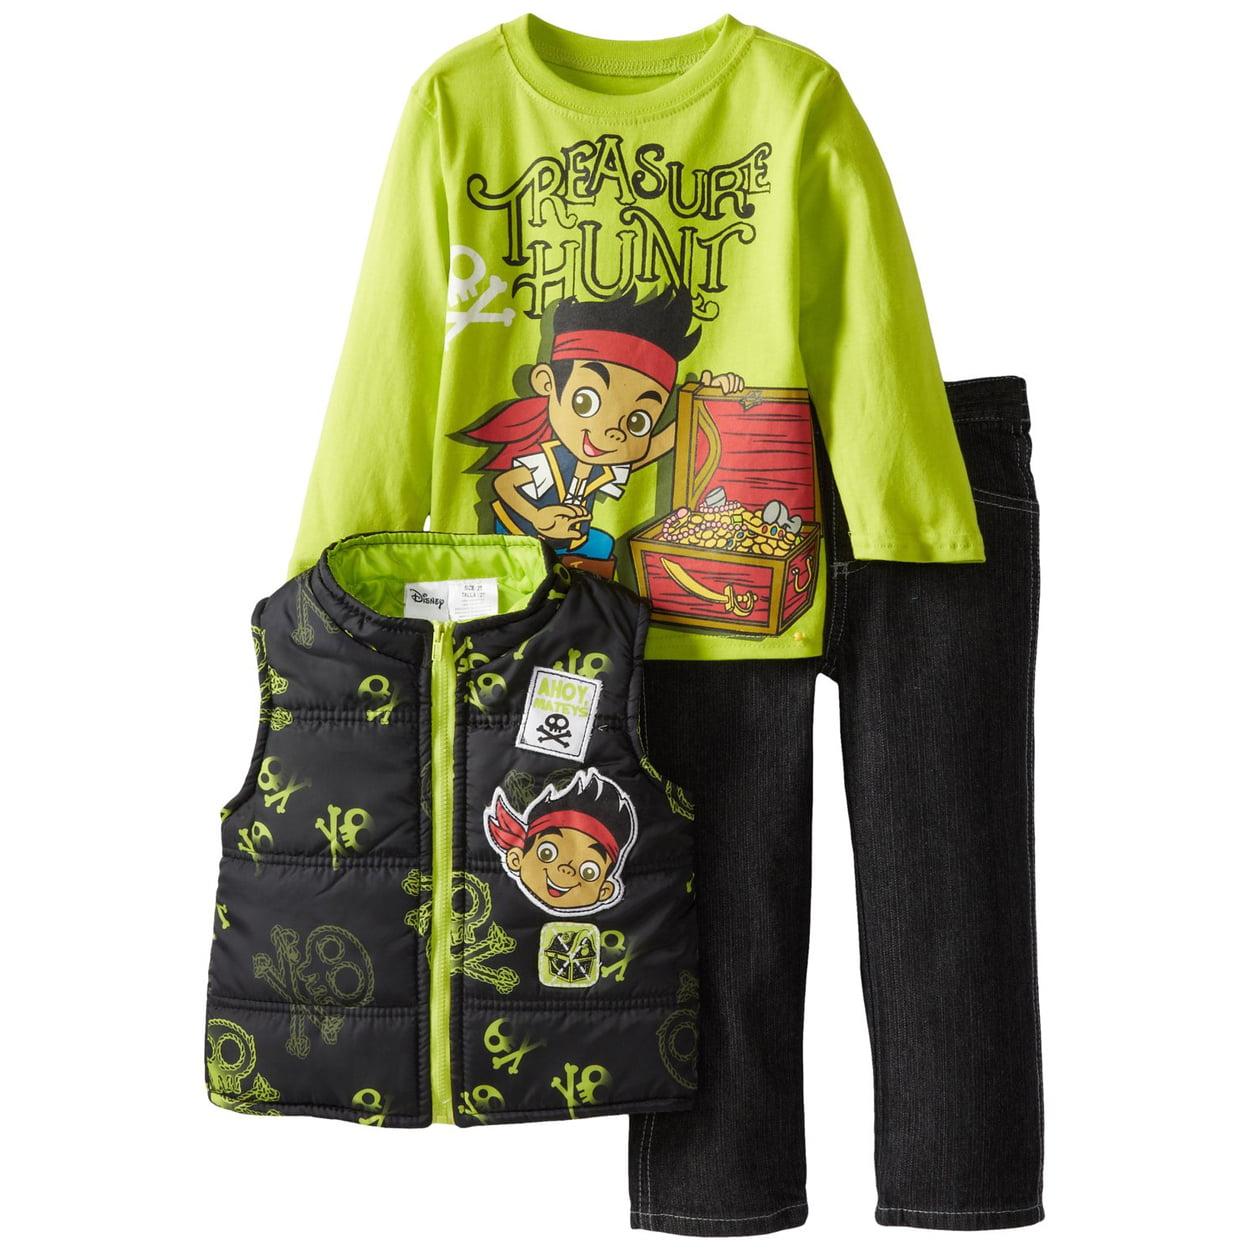 Jake and the Never Land Pirates Boys 3 piece Tee Vest Pants Set 8J6207